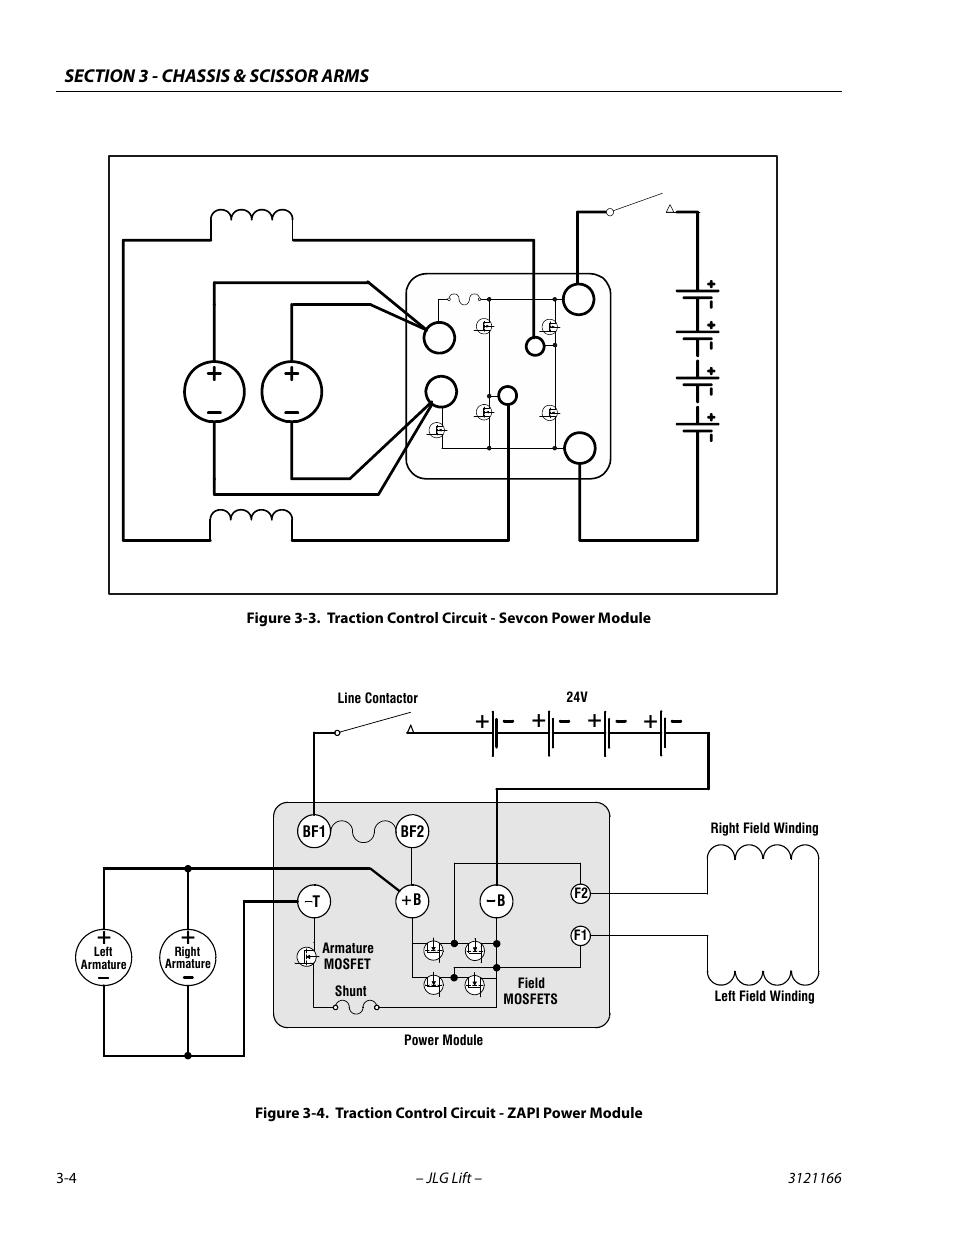 Jlg 3246es Wiring Diagram. assembly assembly 6 connector assembly 1 of 4 6.  jlg 1932e2 wiring diagram jlg e 450 wiring schematics. 17 platform removal  18 scissor arms removal platform. jlg 40h2002-acura-tl-radio.info